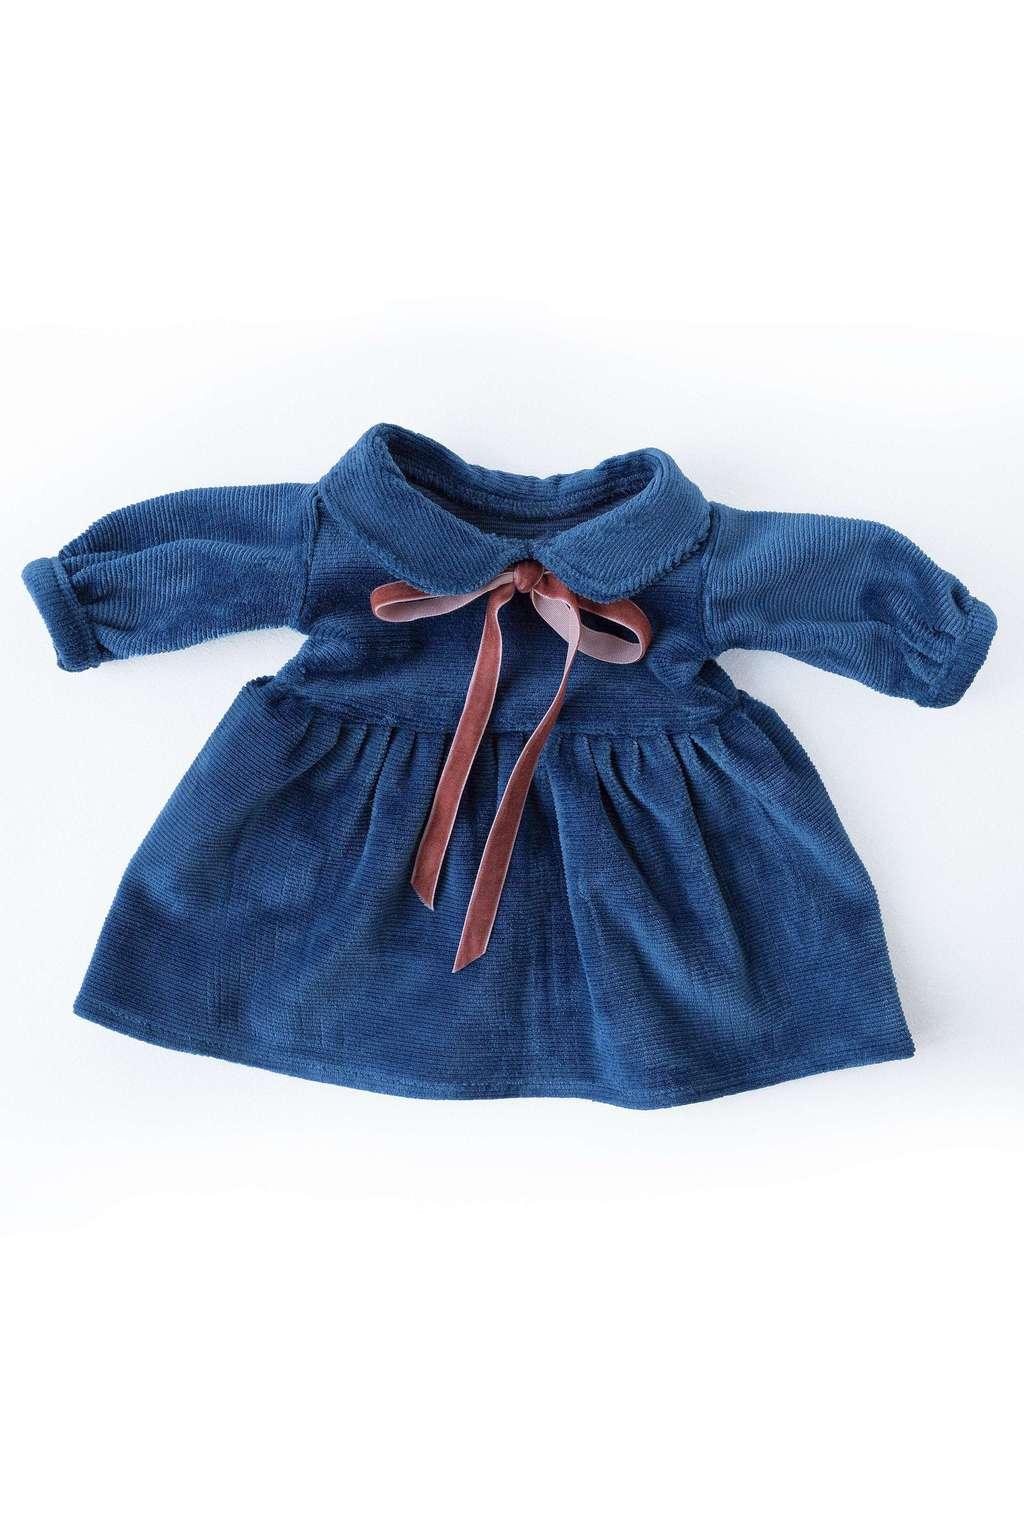 Philomena Kloss kjole - Retro blå -